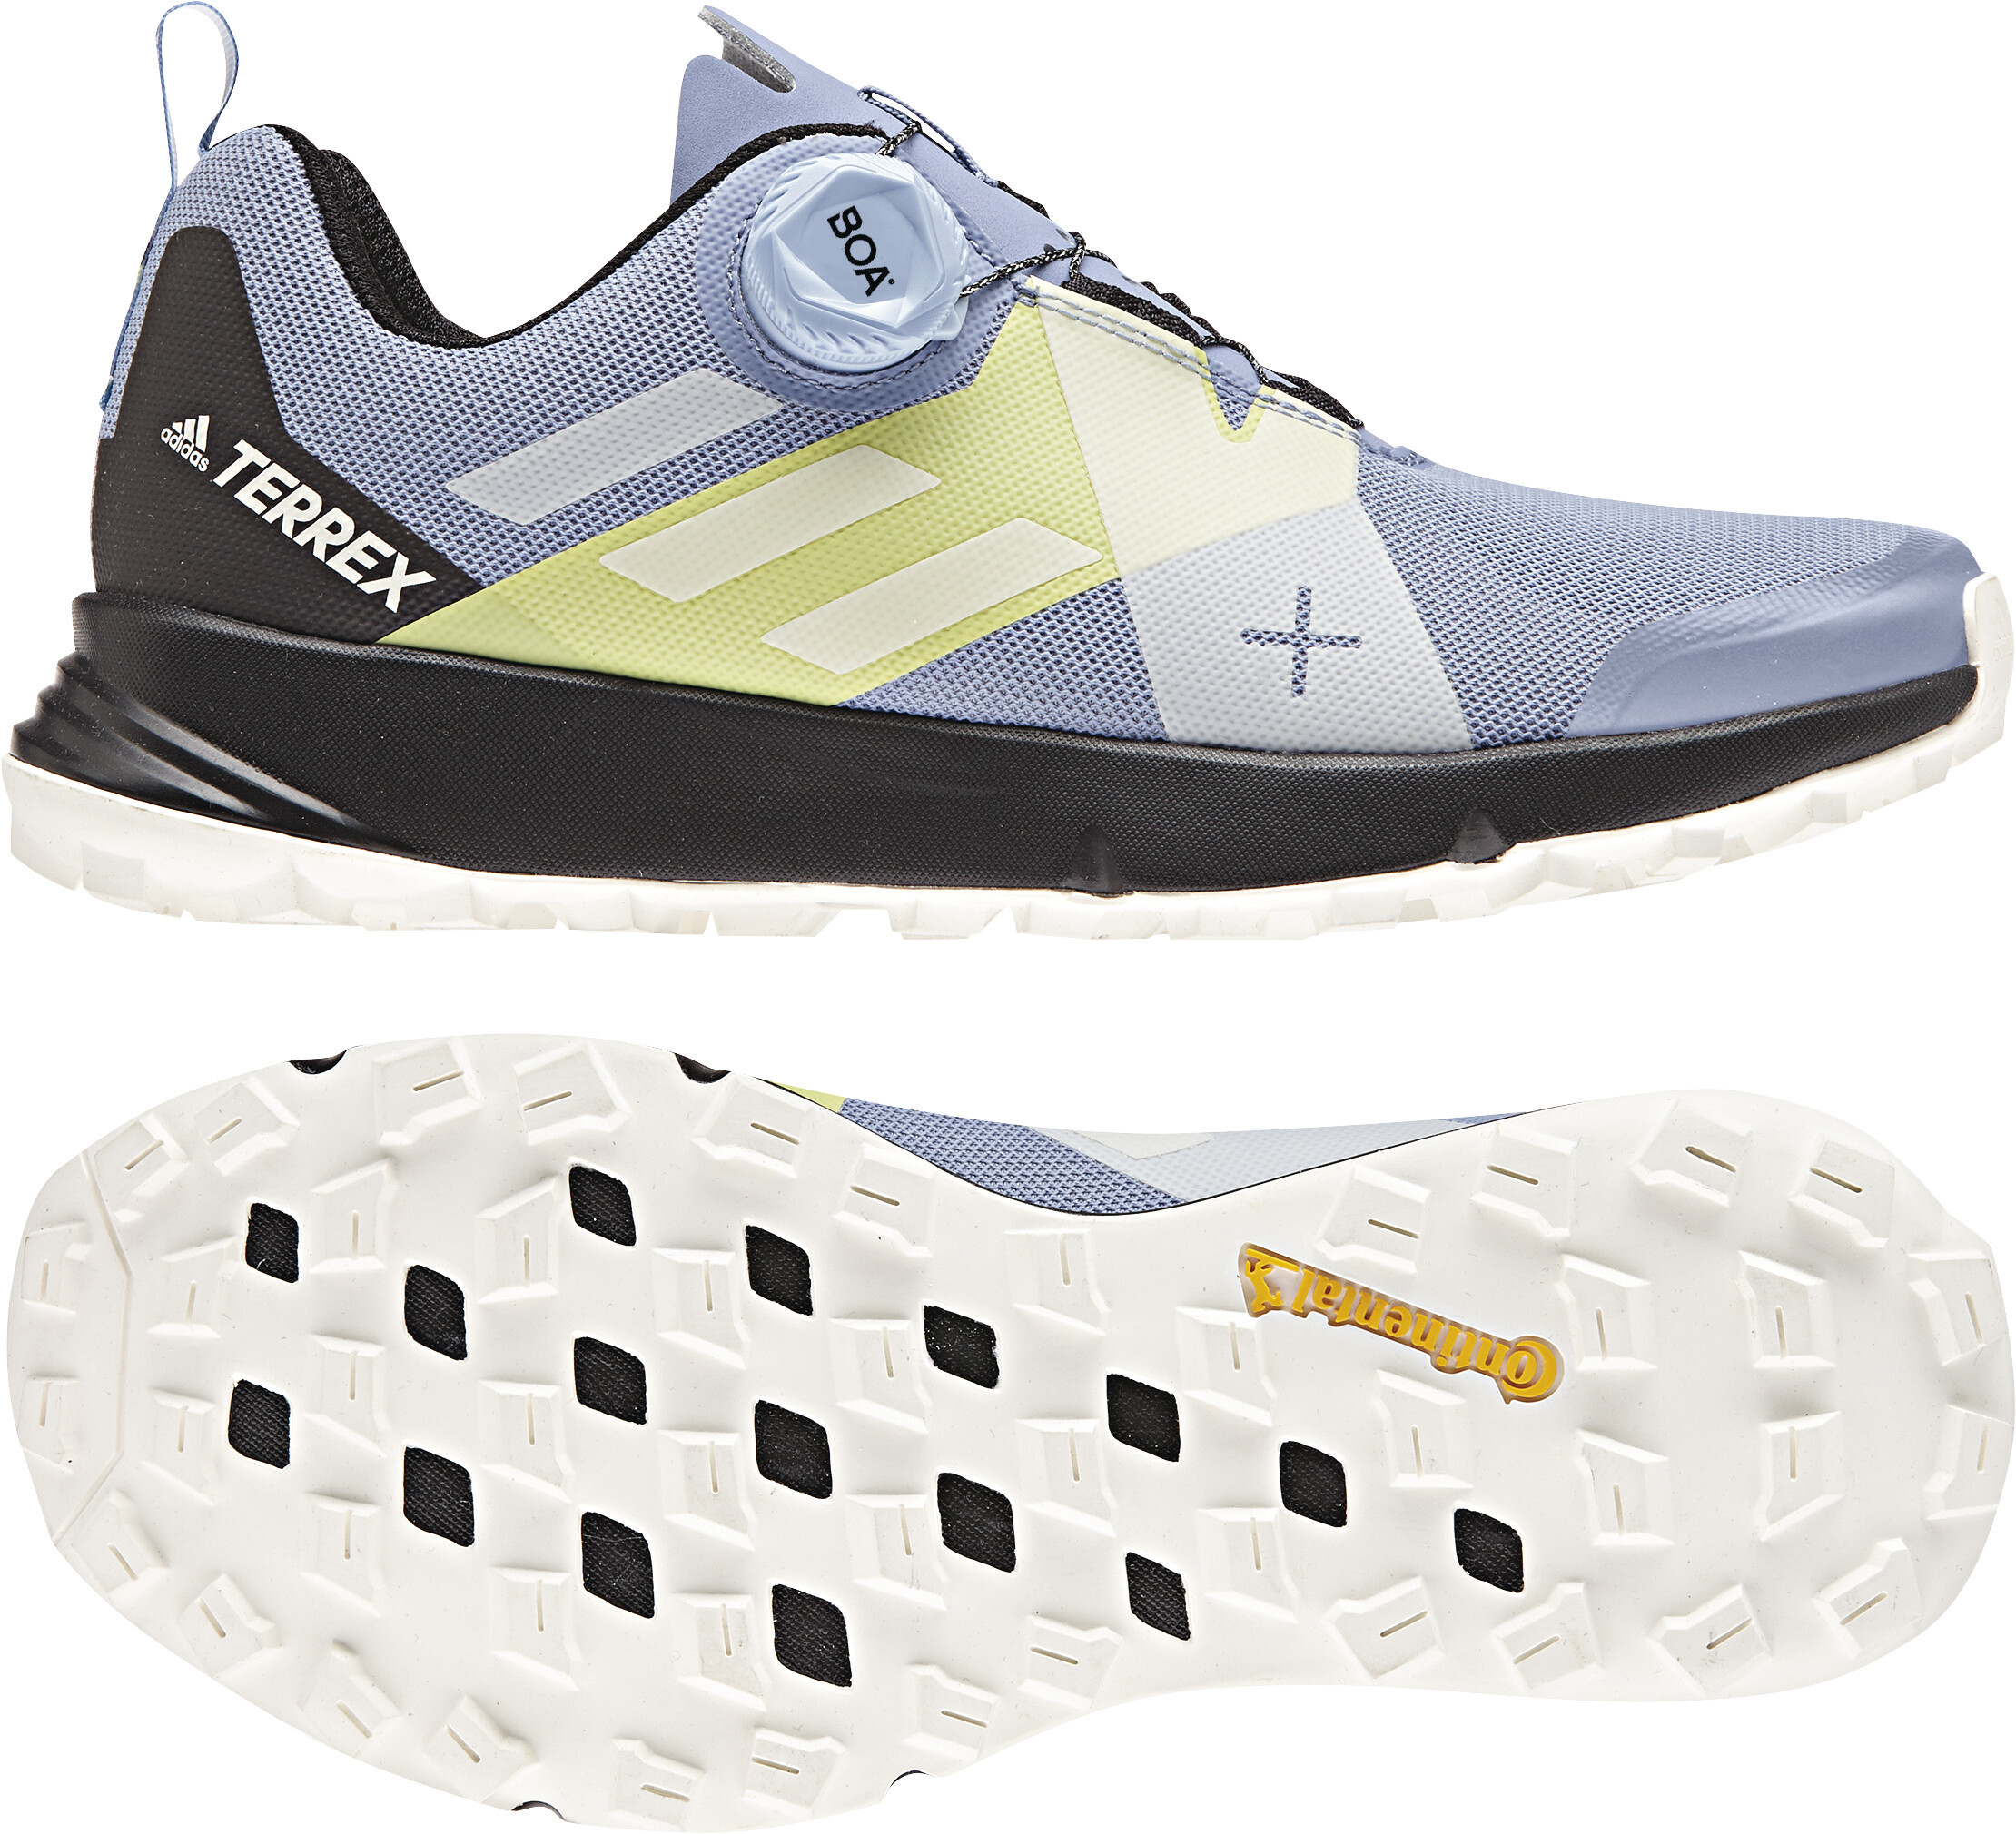 adidas TERREX Two Boa Löparskor Dam gul blå - till fenomenalt pris ... db92b4434fef2